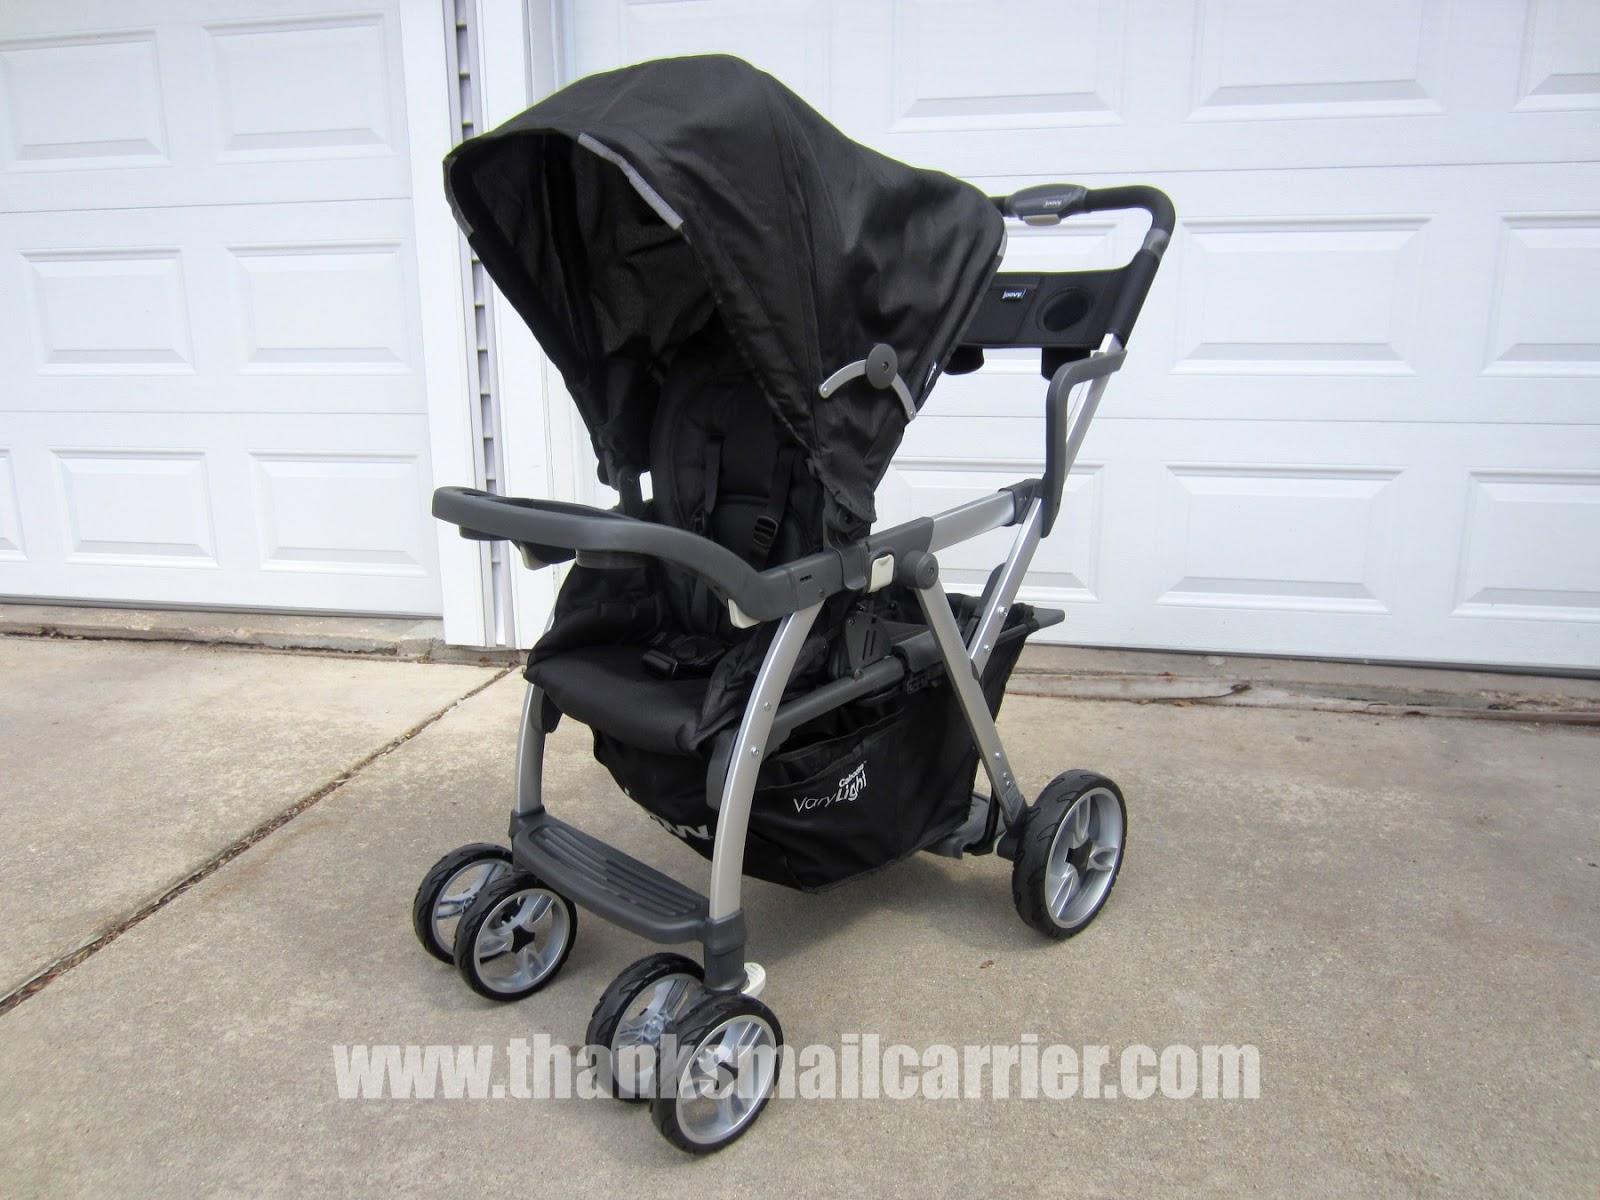 Joovy Varylight stroller